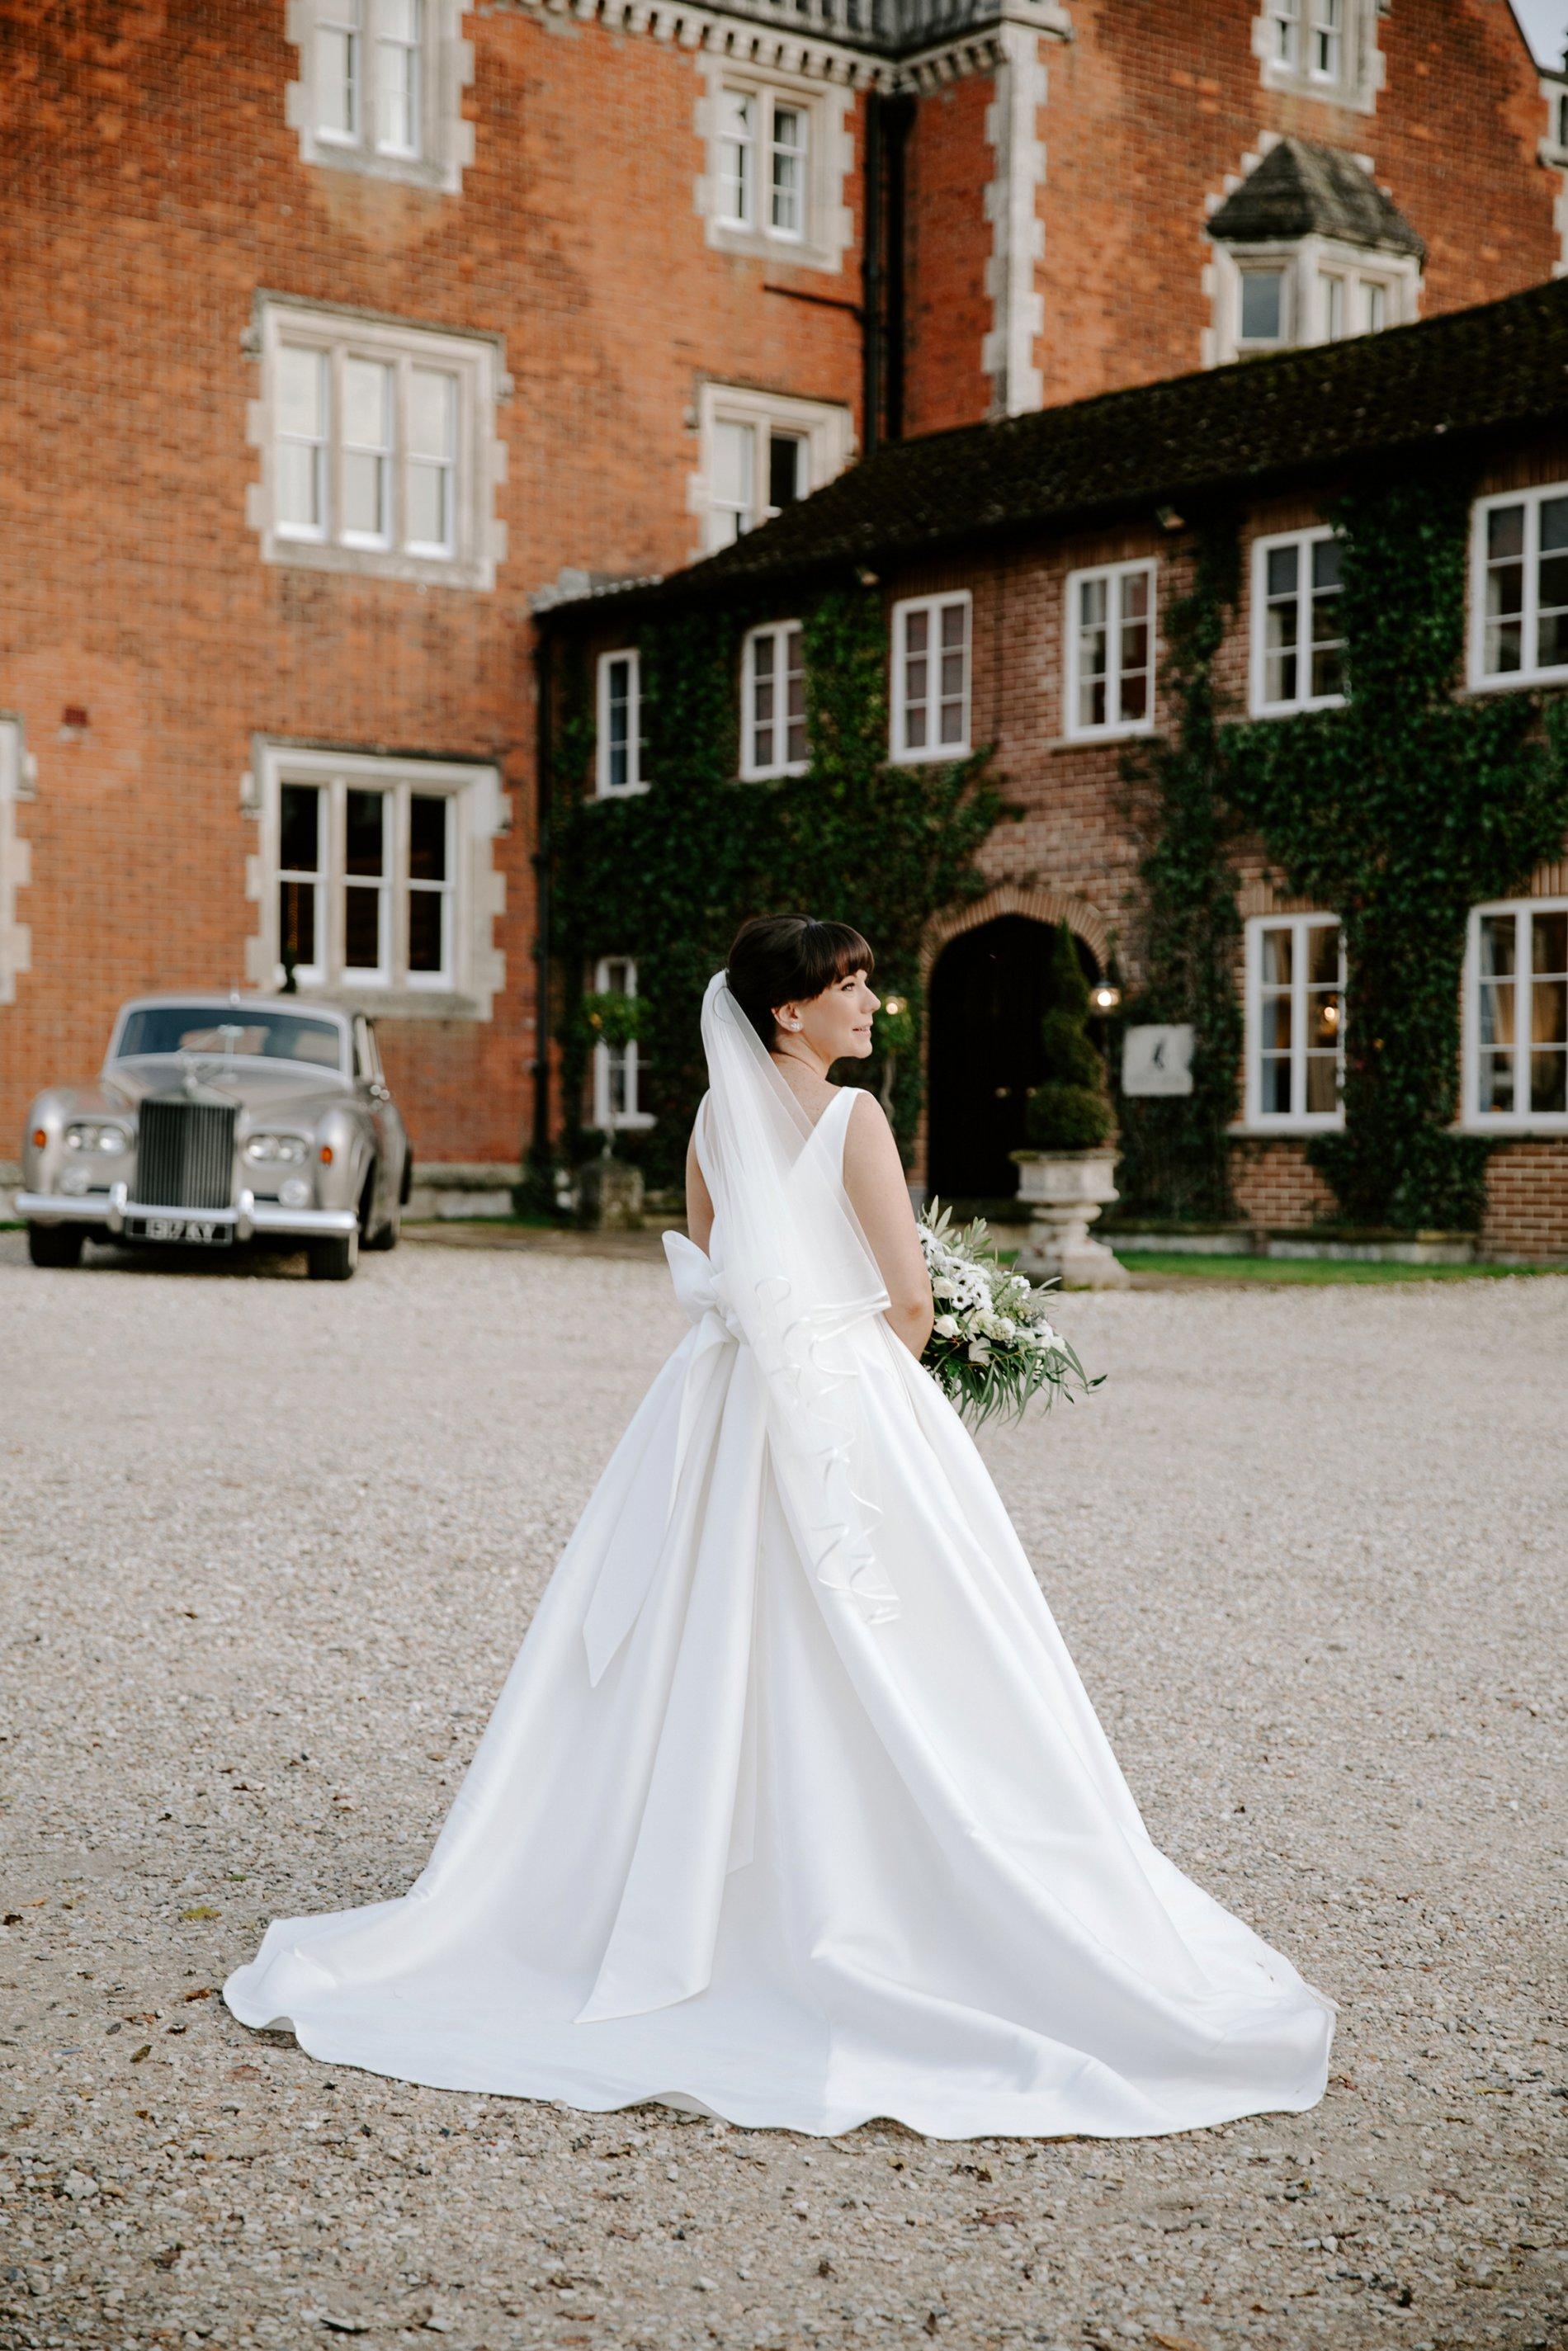 An Elegant White Wedding at Thicket Priory (c) Carla Whittingham Photography (78)